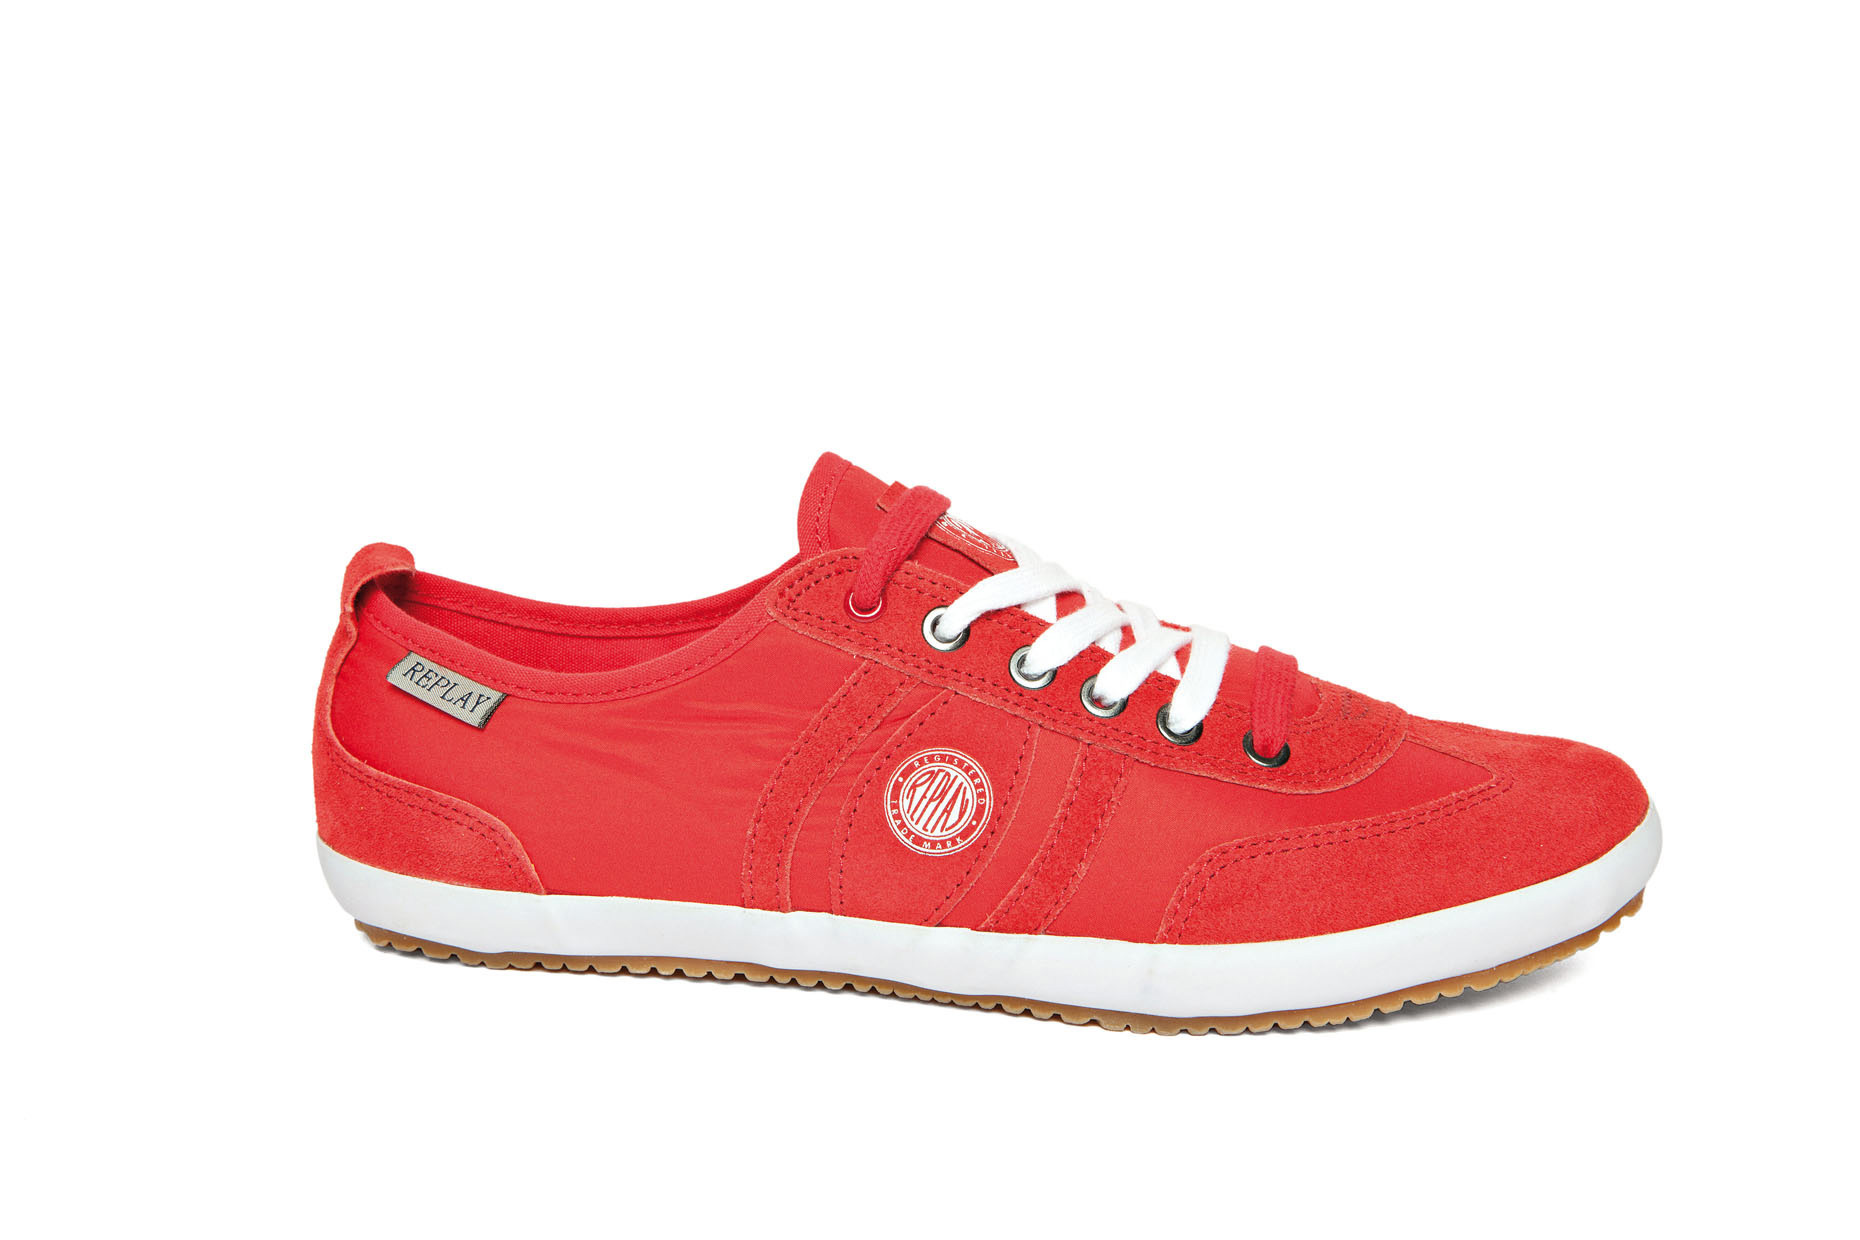 Replay Cipő - Rod - RV510001S-0047 - Office Shoes Magyarország 70d7172857